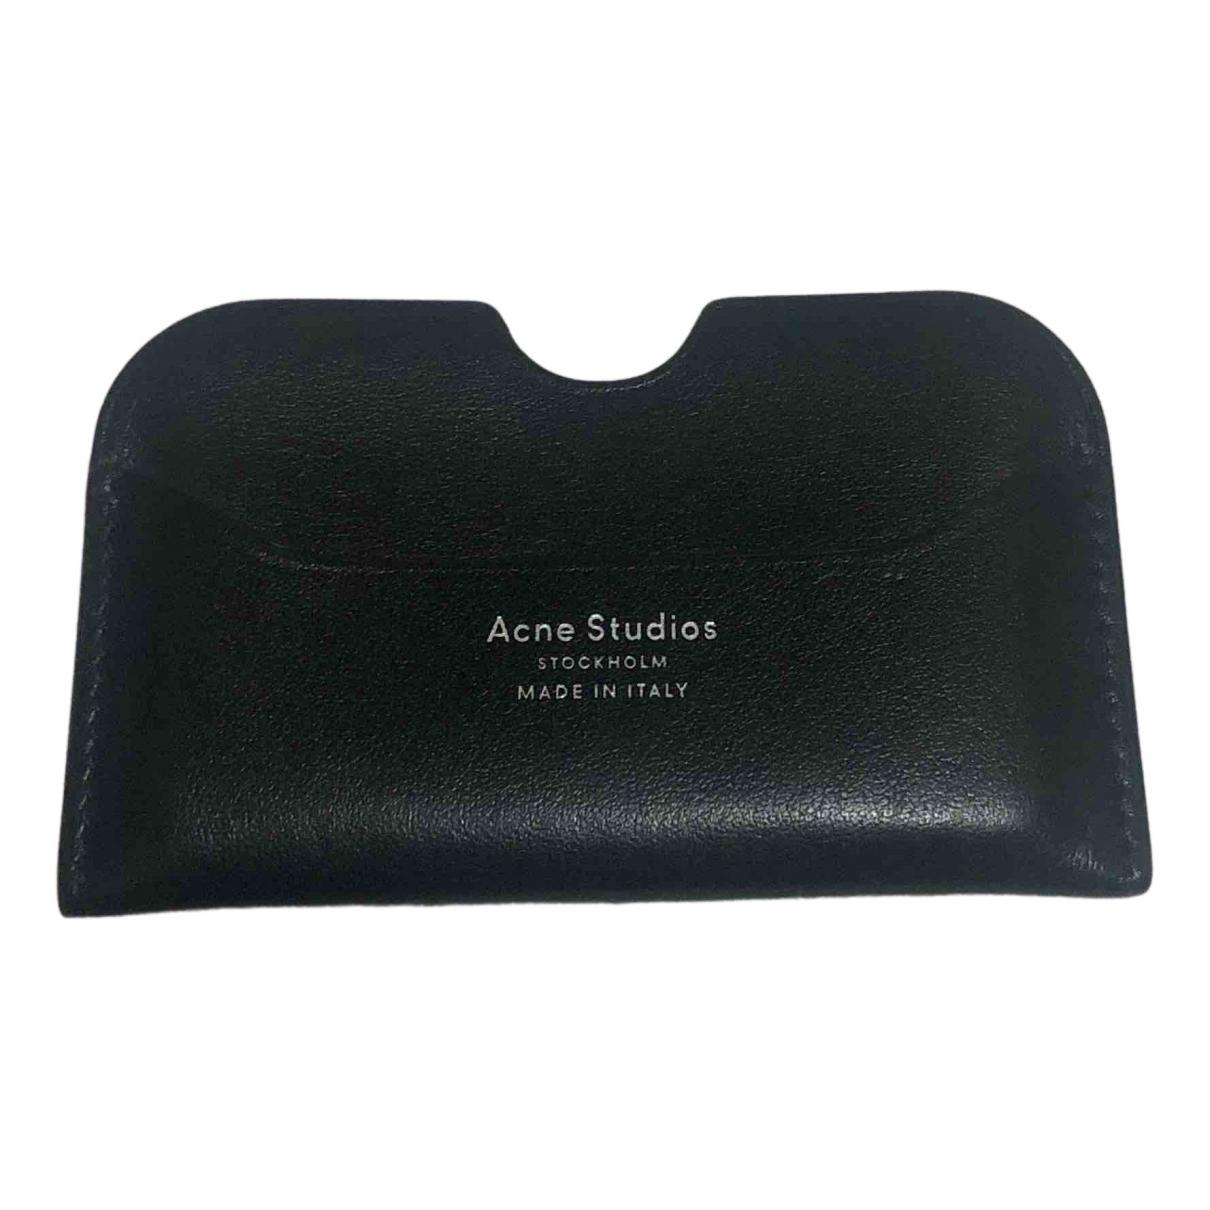 Acne Studios \N Black Leather Purses, wallet & cases for Women \N